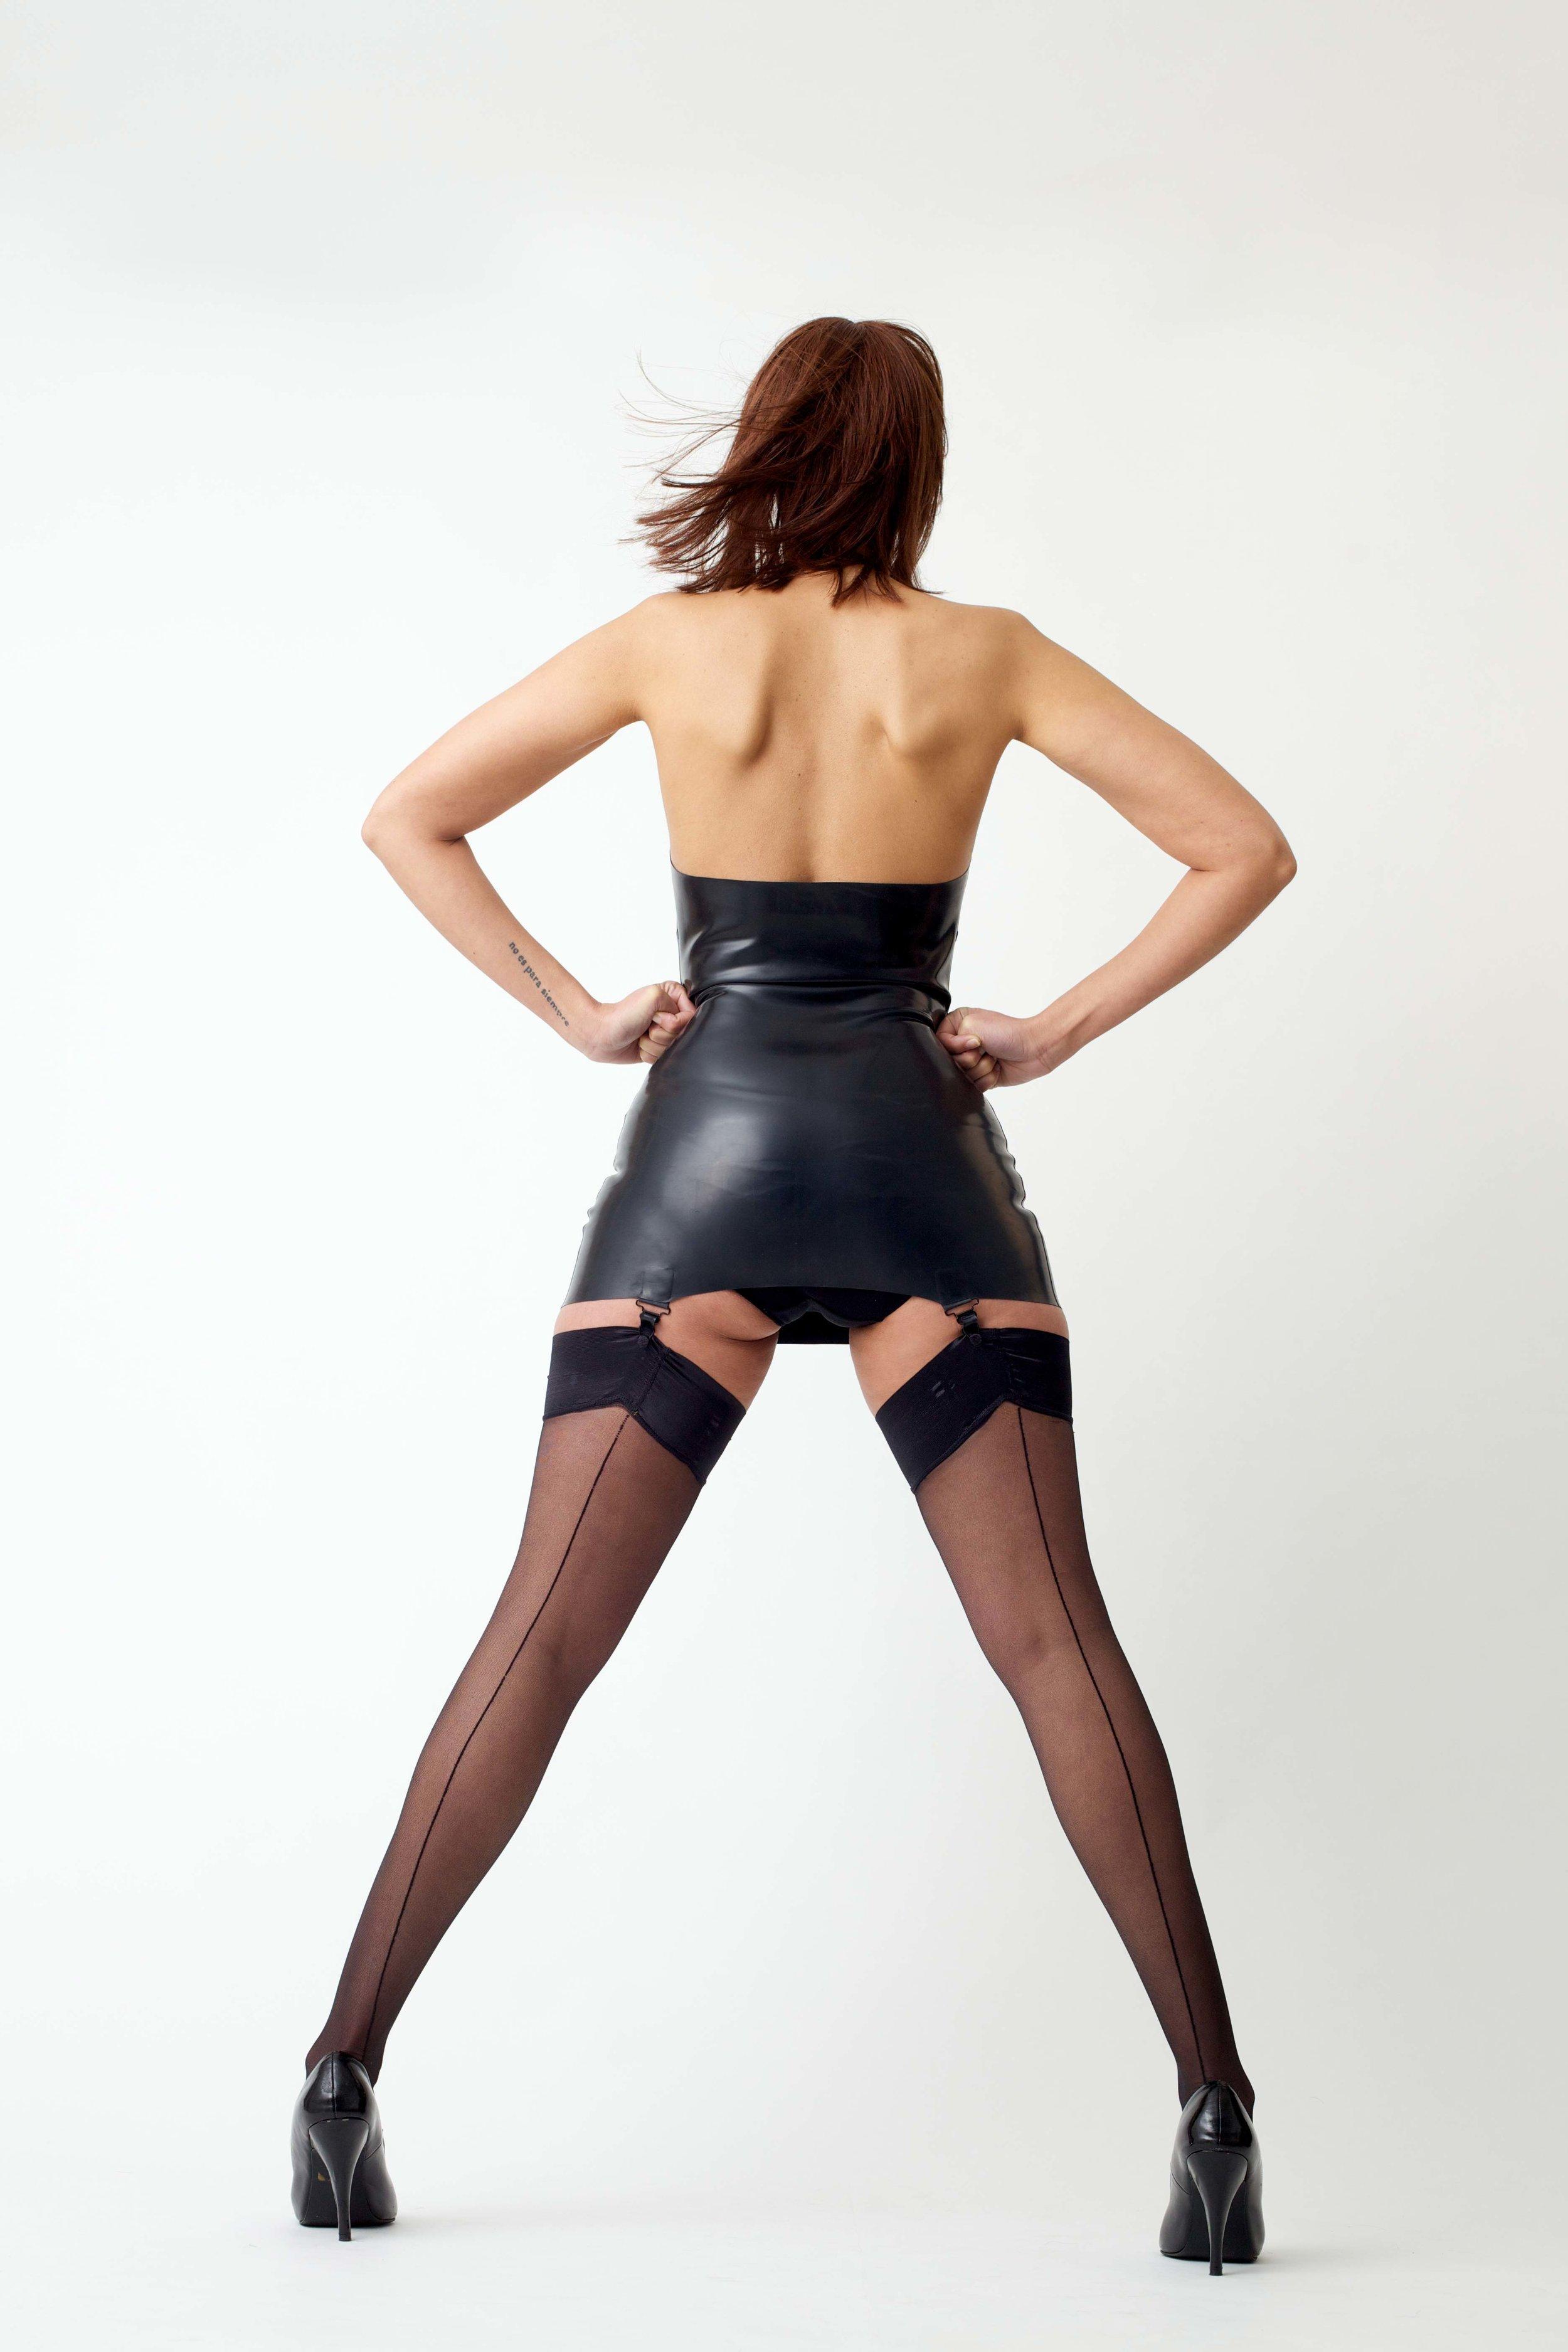 best-london-female-domination-for-male-submissives-caning-bondage-spanking-mistress.jpg